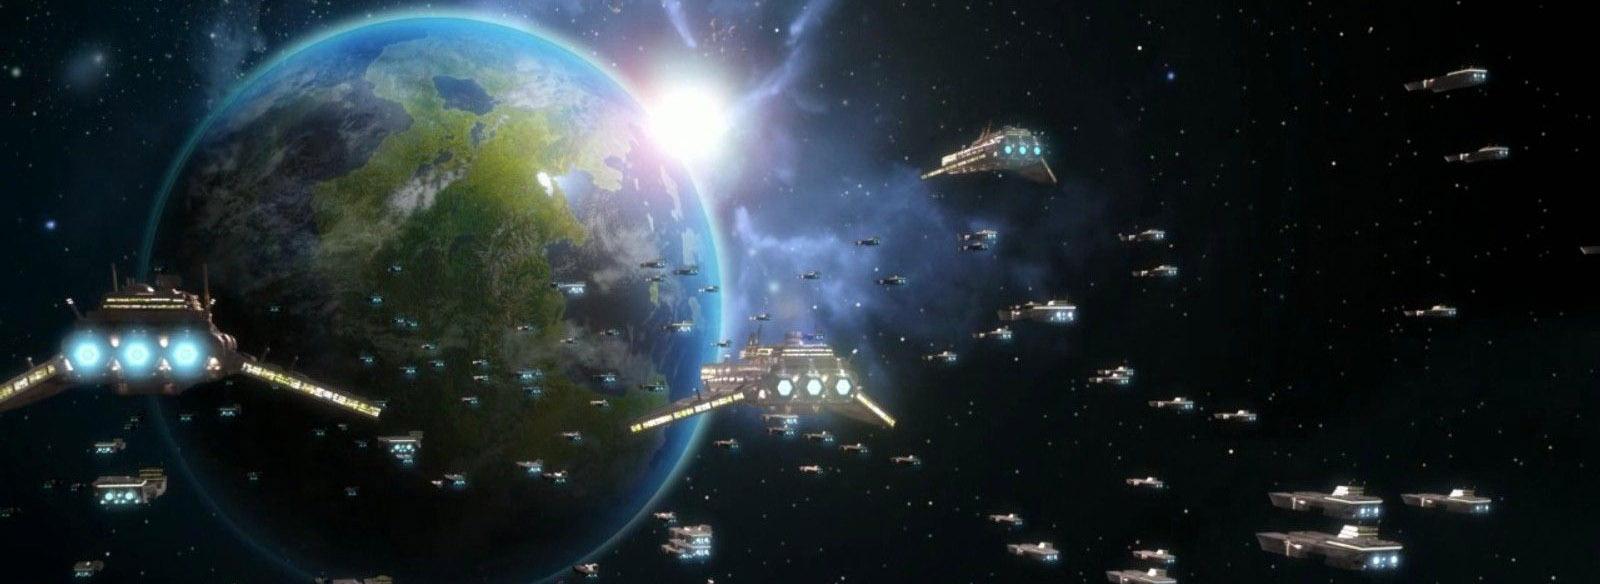 Battle Worlds Kronos - VGProfessional Review (6)